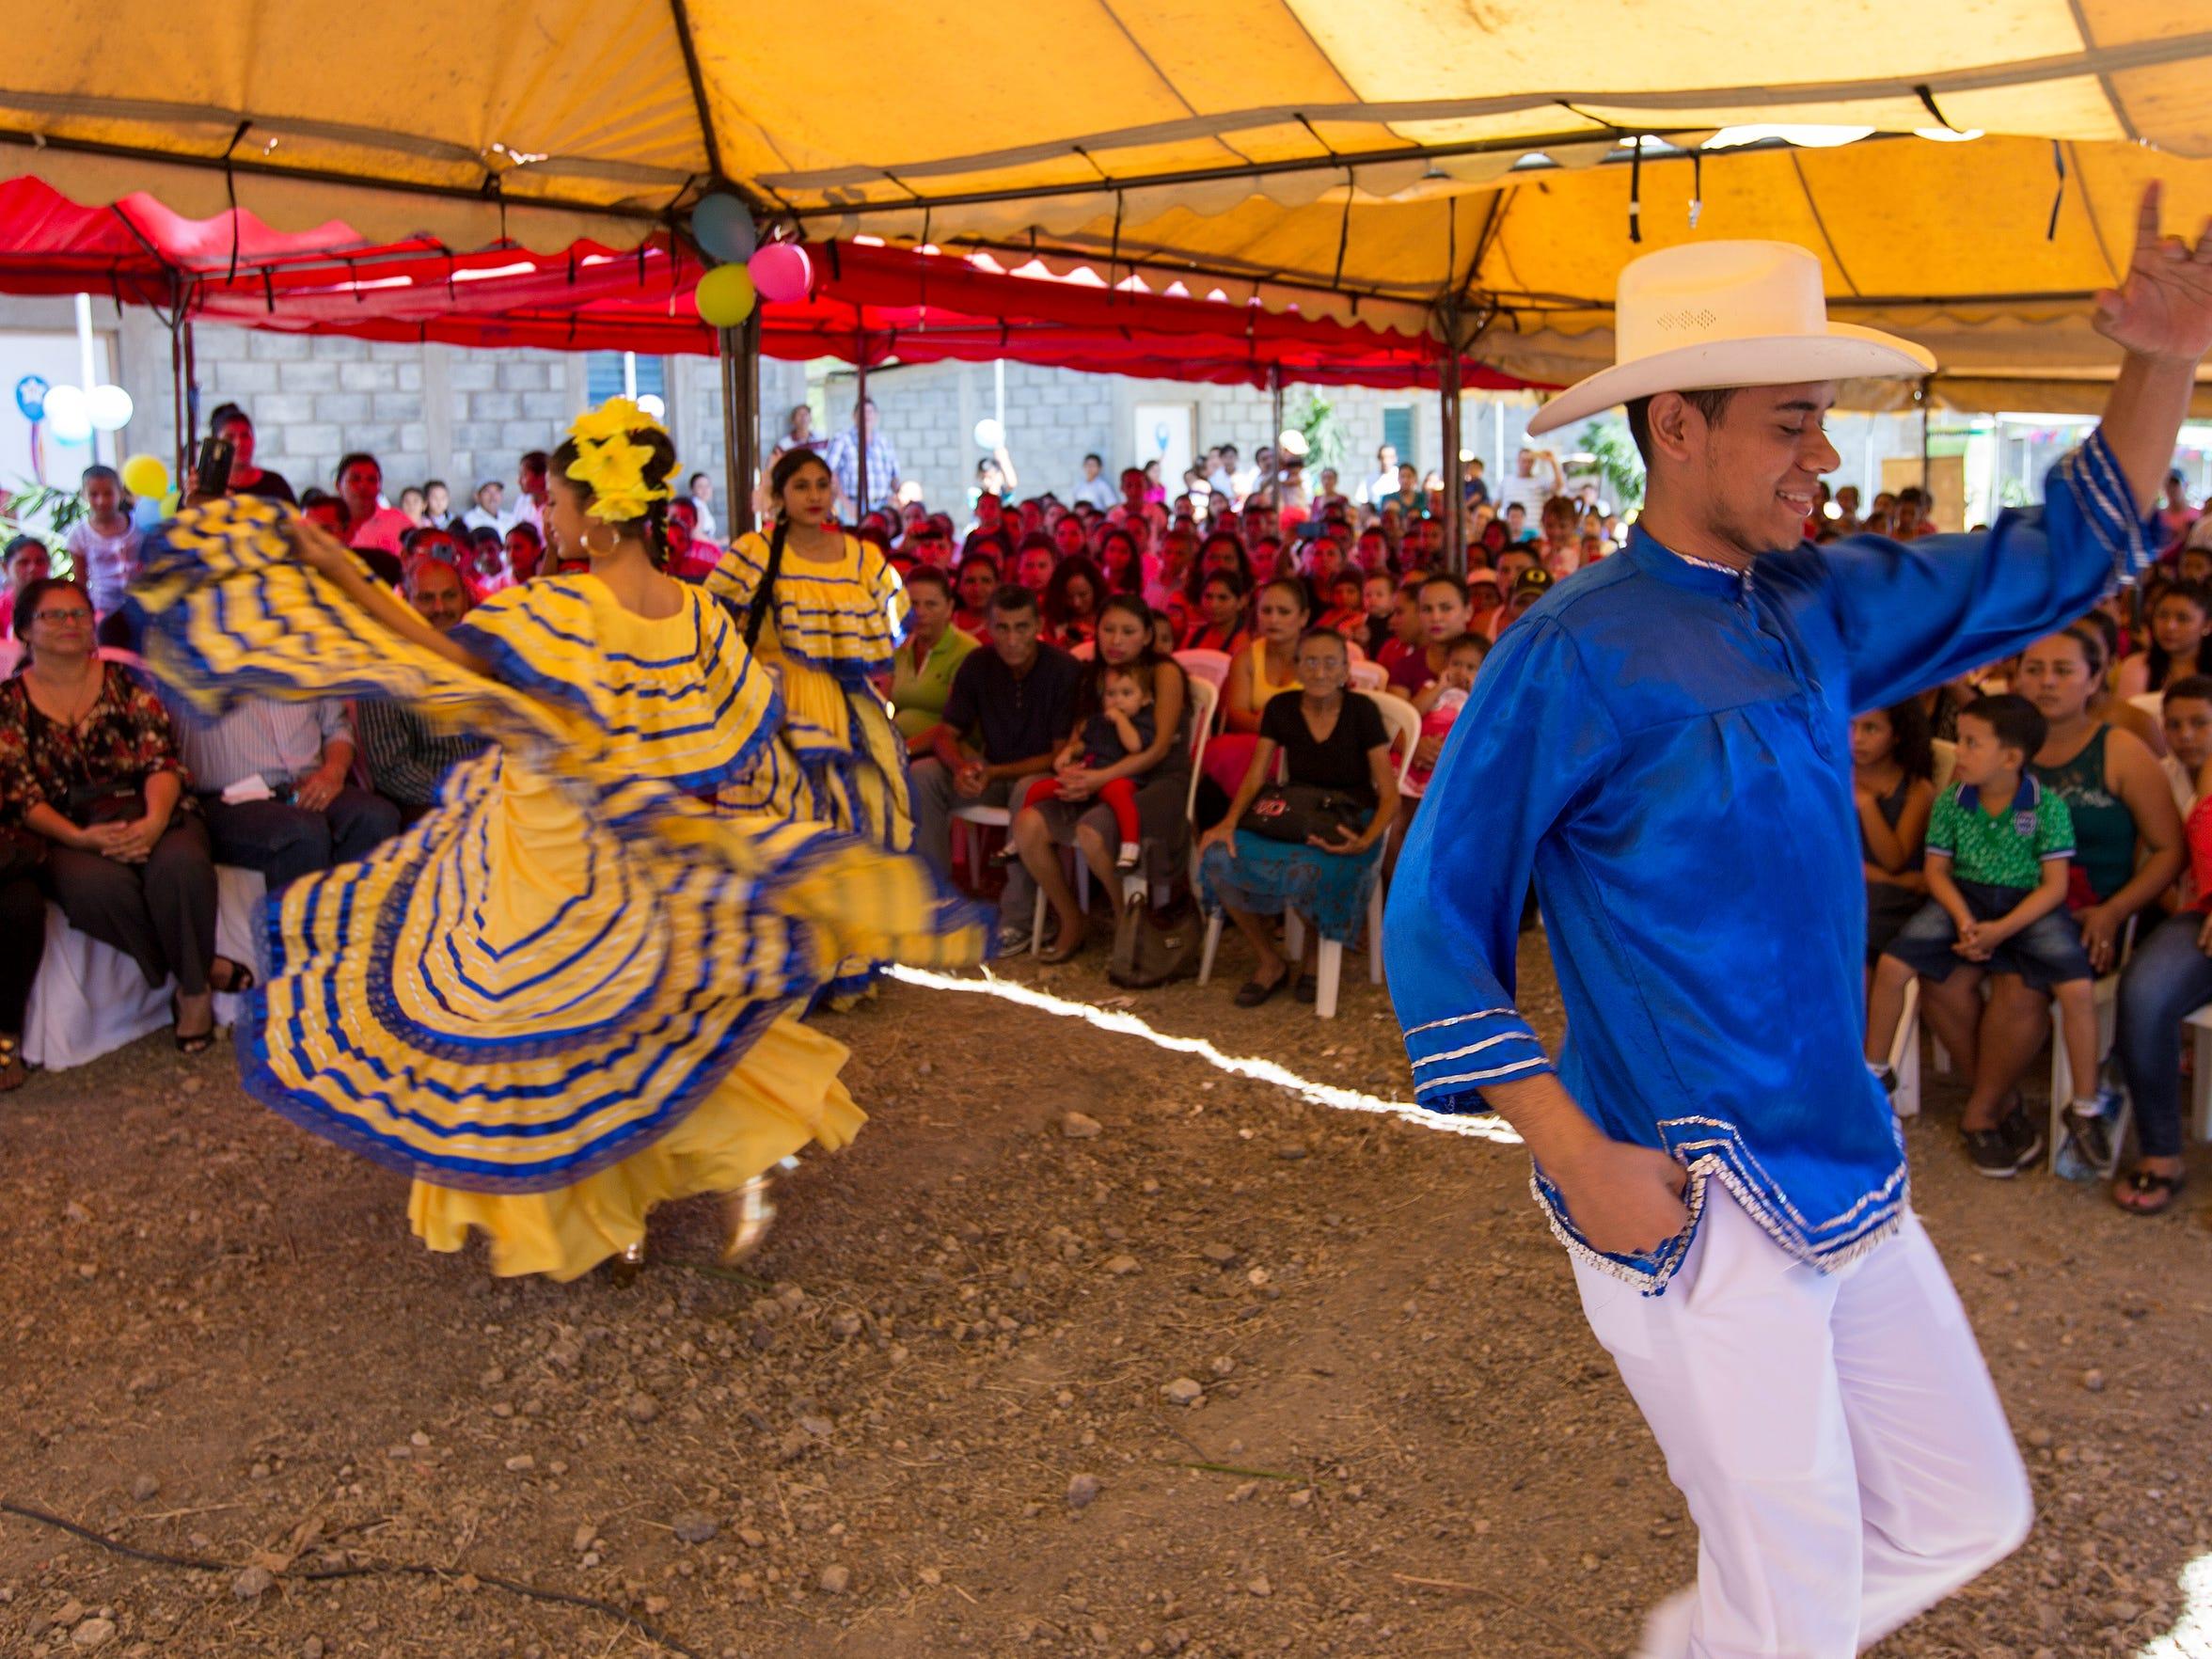 Dancers in traditional costumes performed Nicaraguan